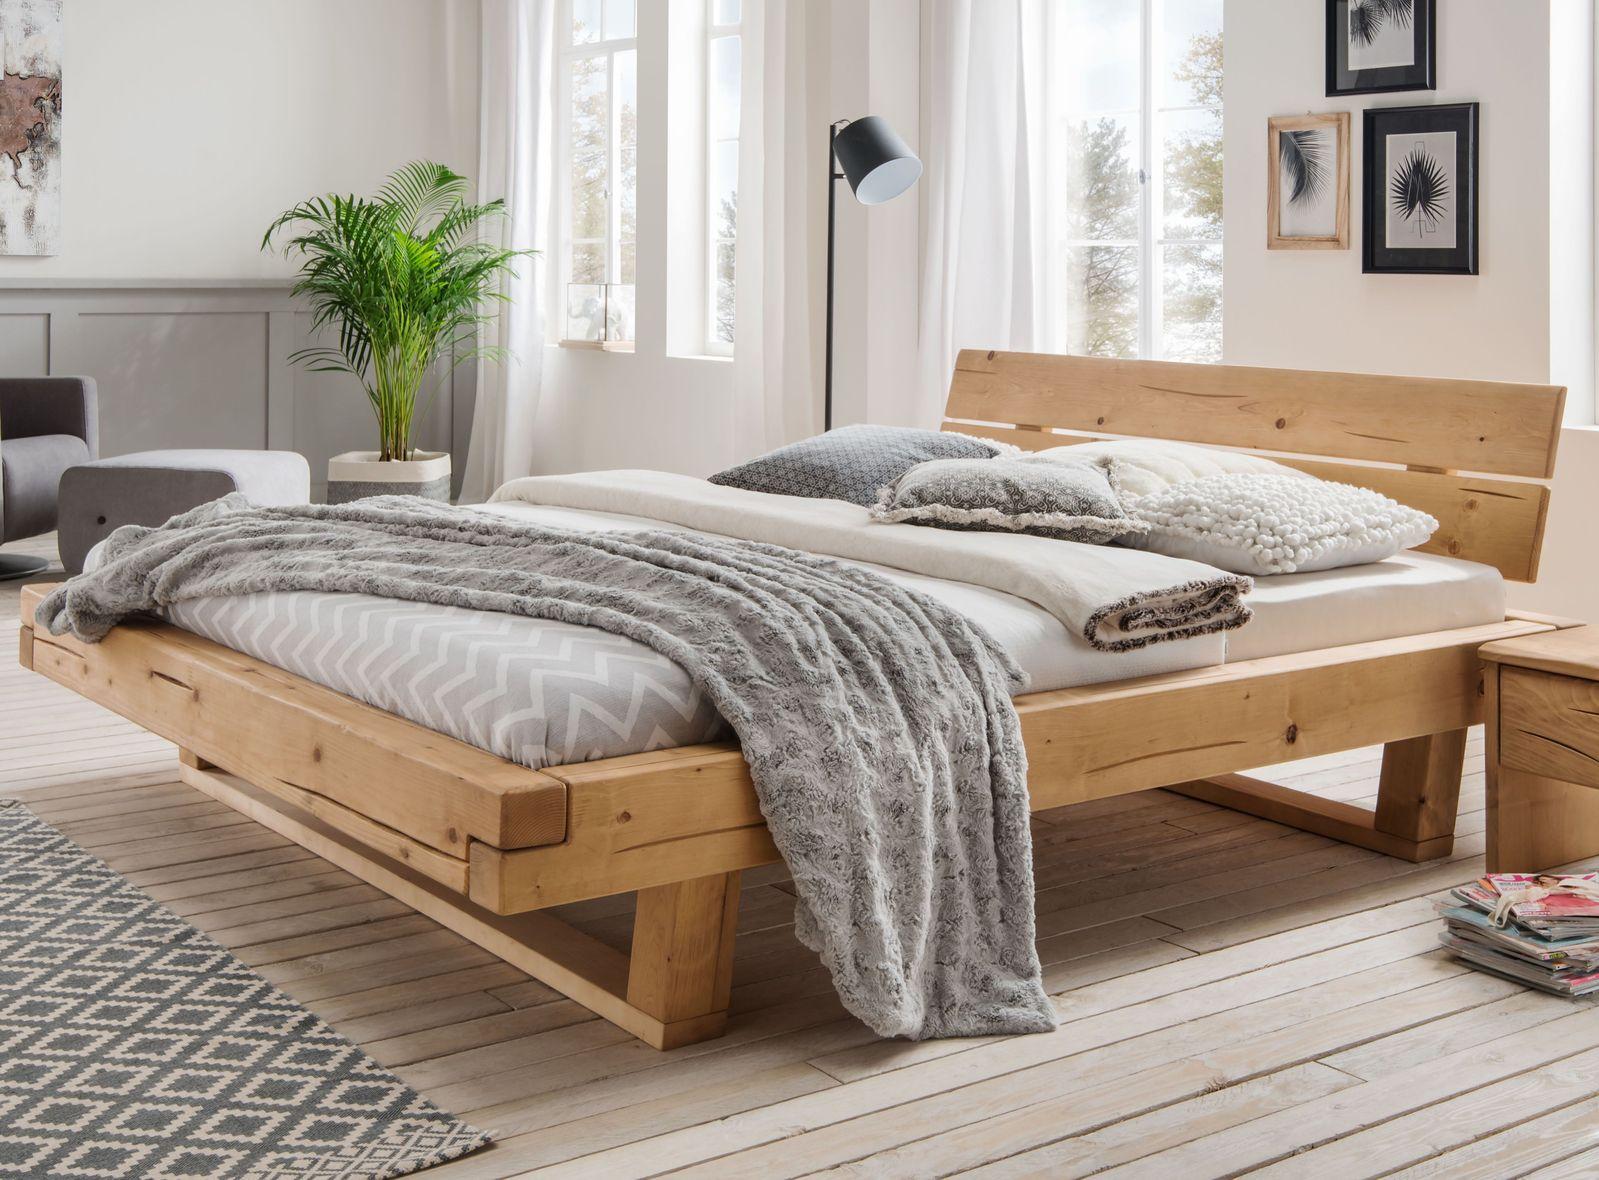 Balkenbett aus Fichtenholz natur geölt bis 200 kg - Basiliano